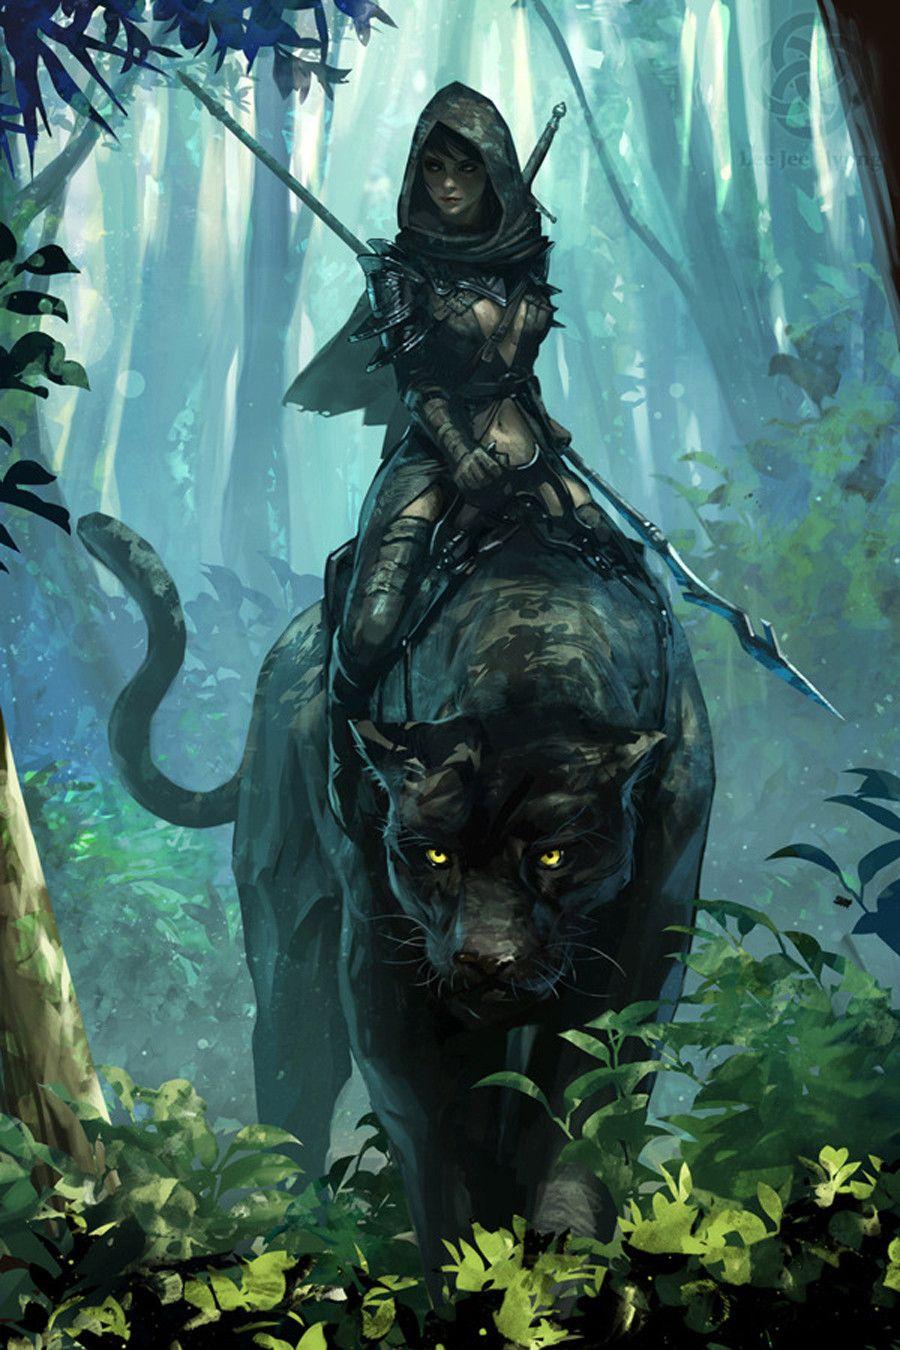 Creative Digital Illustrations | Inspiration | Graphic Design Junction |  Fantasy artwork, Fantasy art, Fantasy warrior